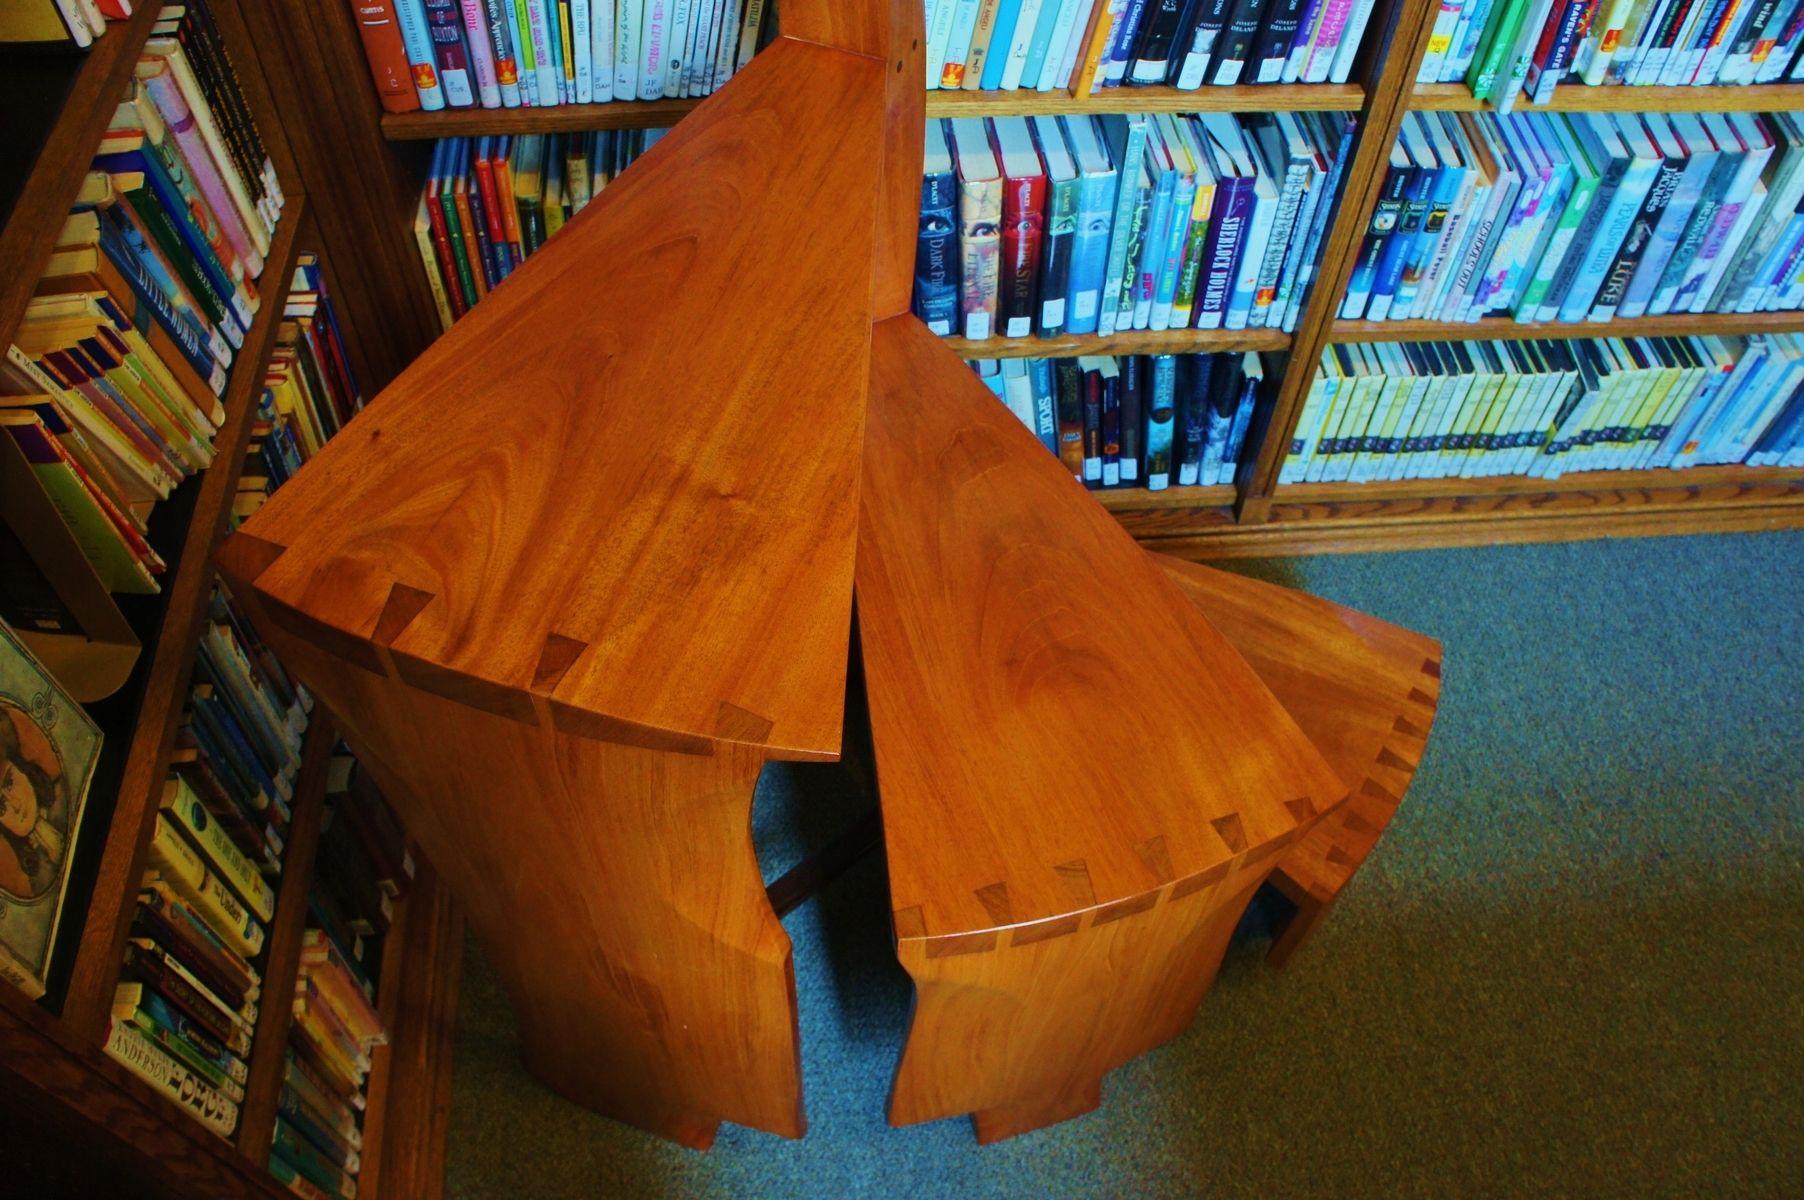 Custom Spiral Library LadderStep Stool By Bucks County Craftmasters